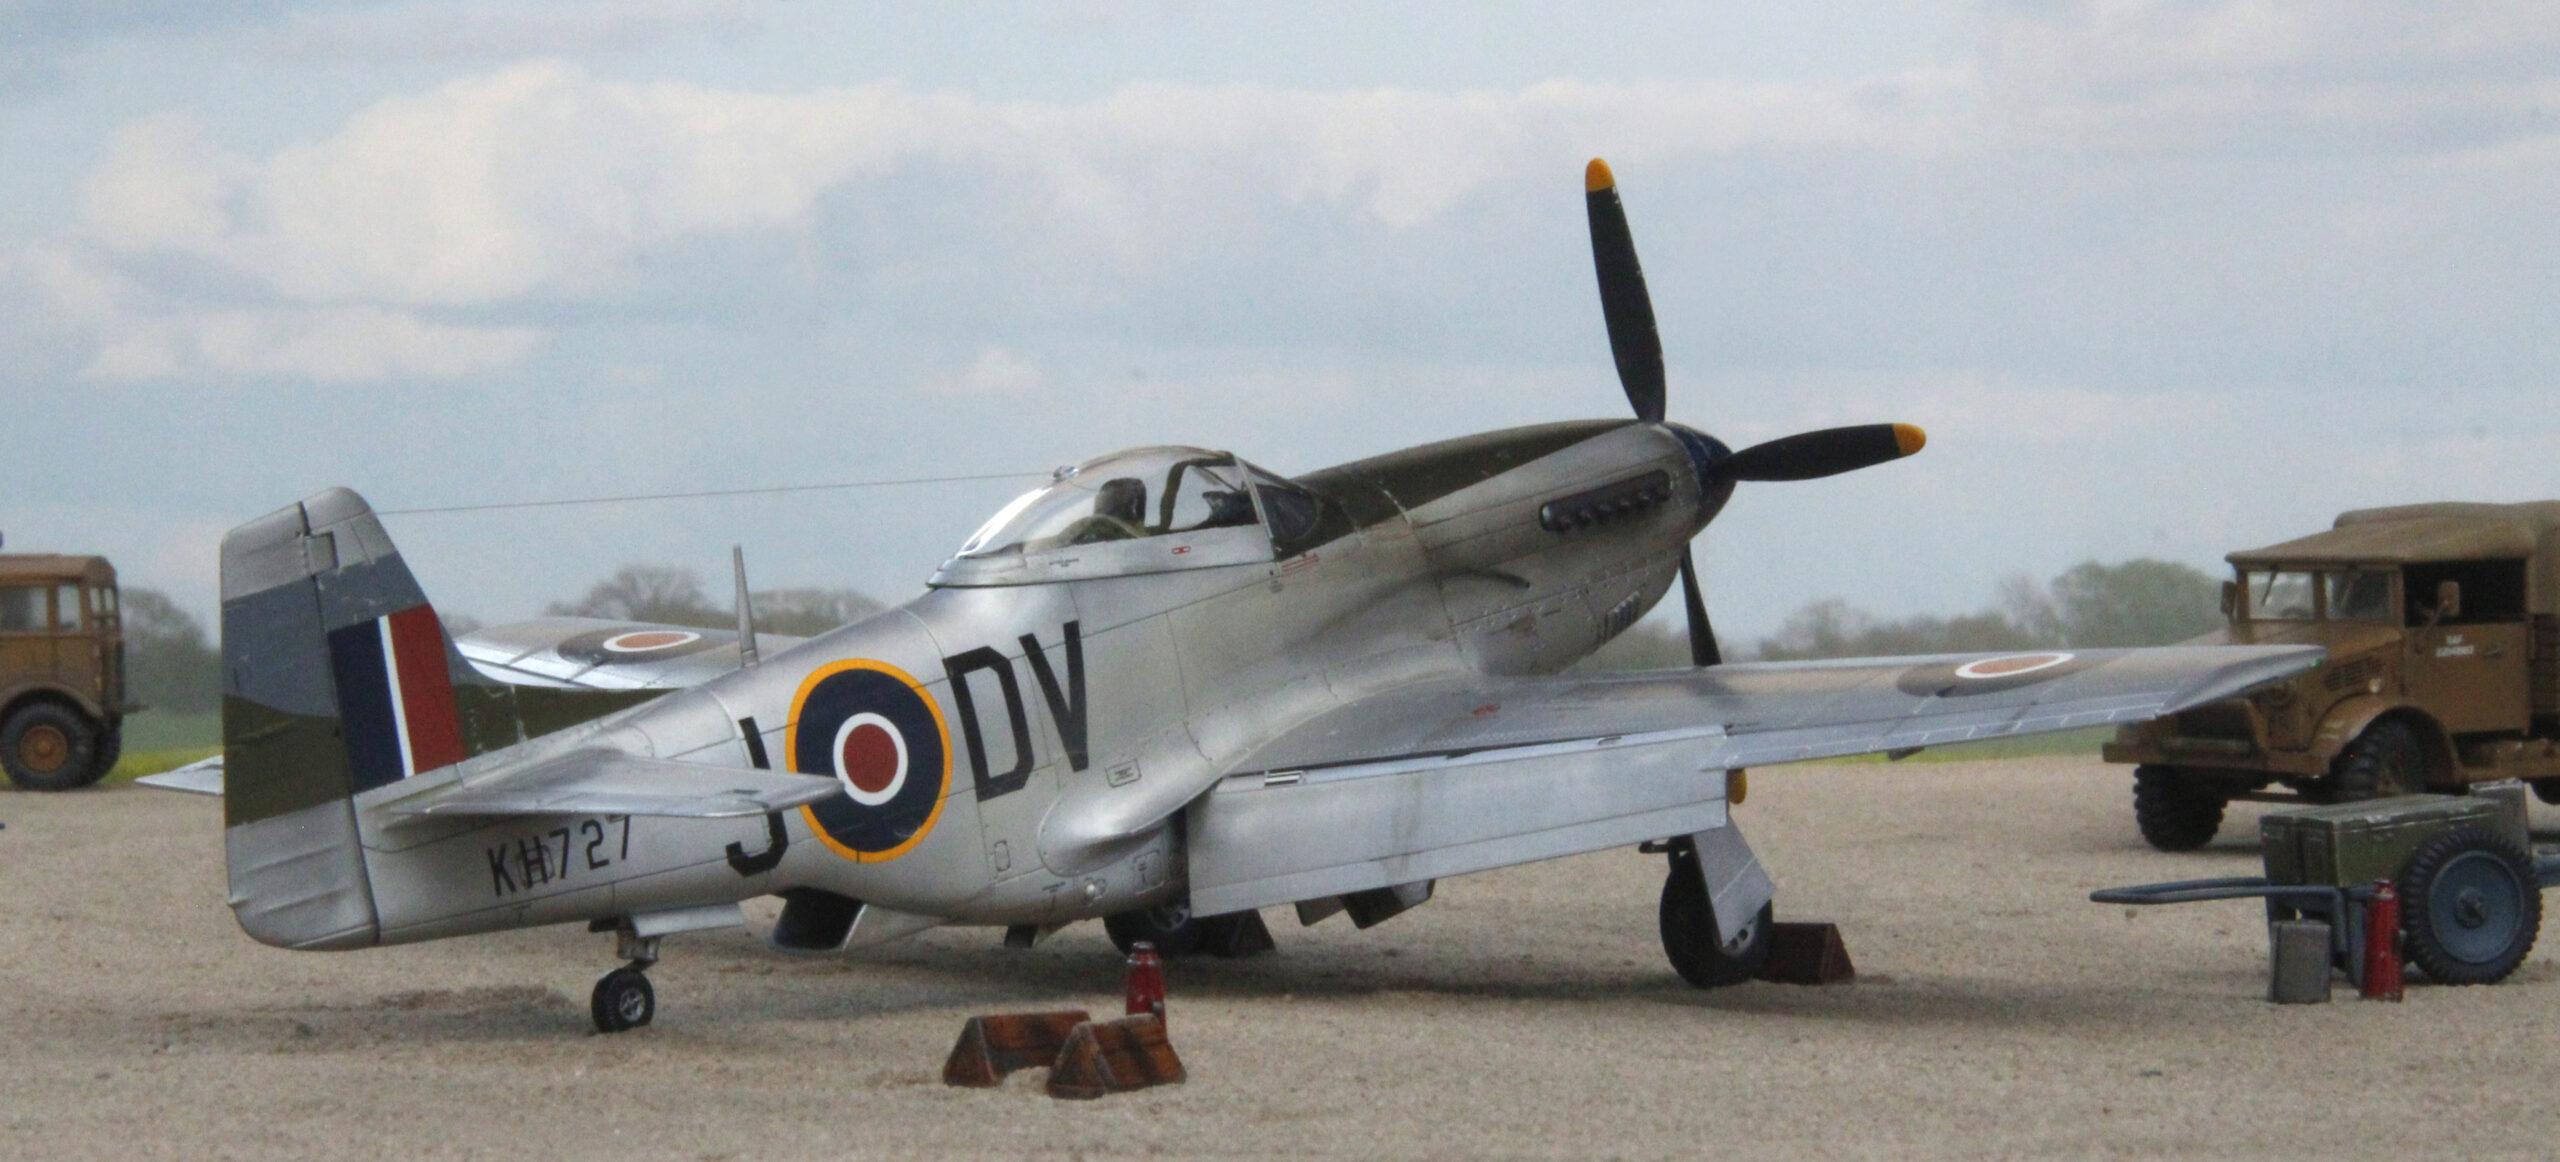 P-51K Mustang Mk IVa RAF in 1/48 scale